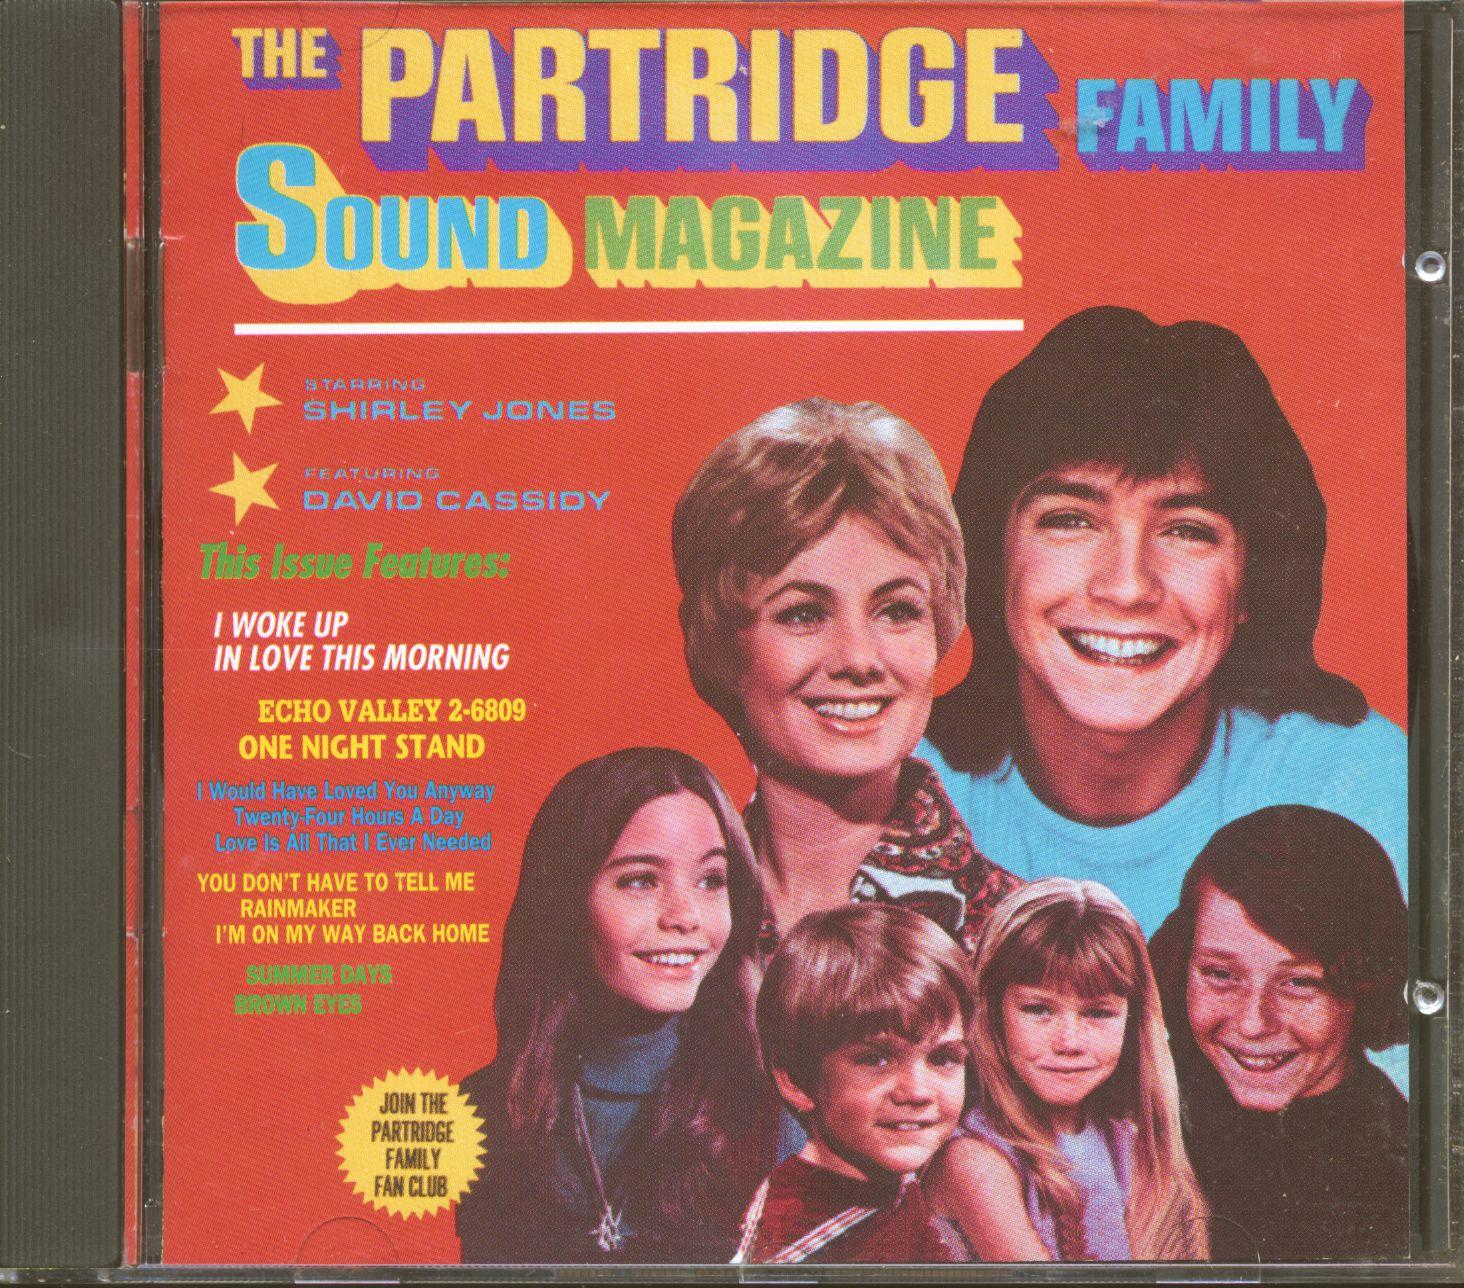 The Partridge Family Cd Sound Magazine Cd Bear Family